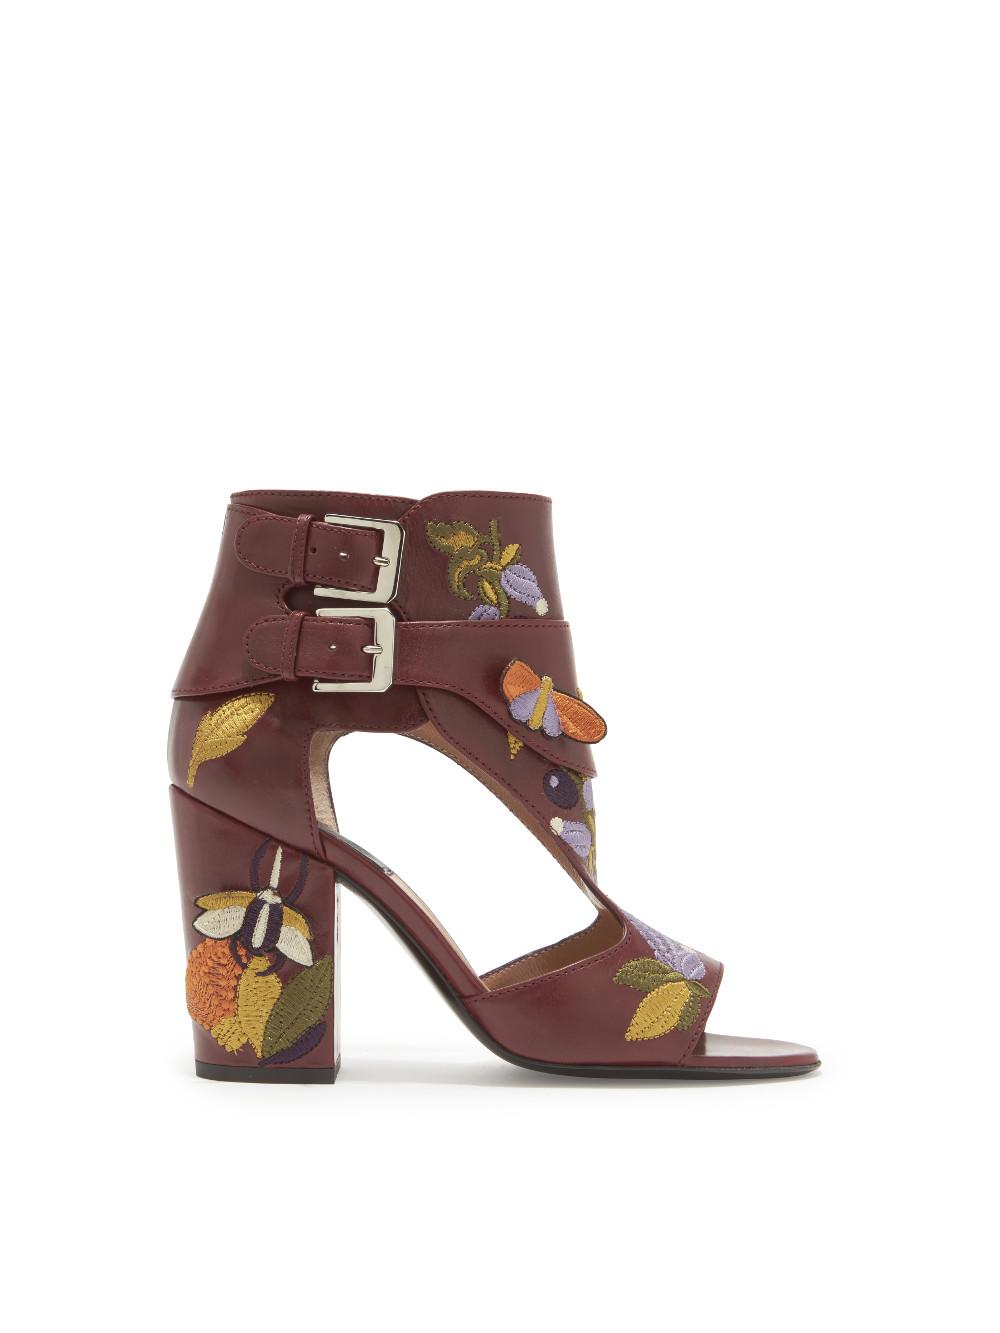 Chaussures Rush - Laurence Dacade